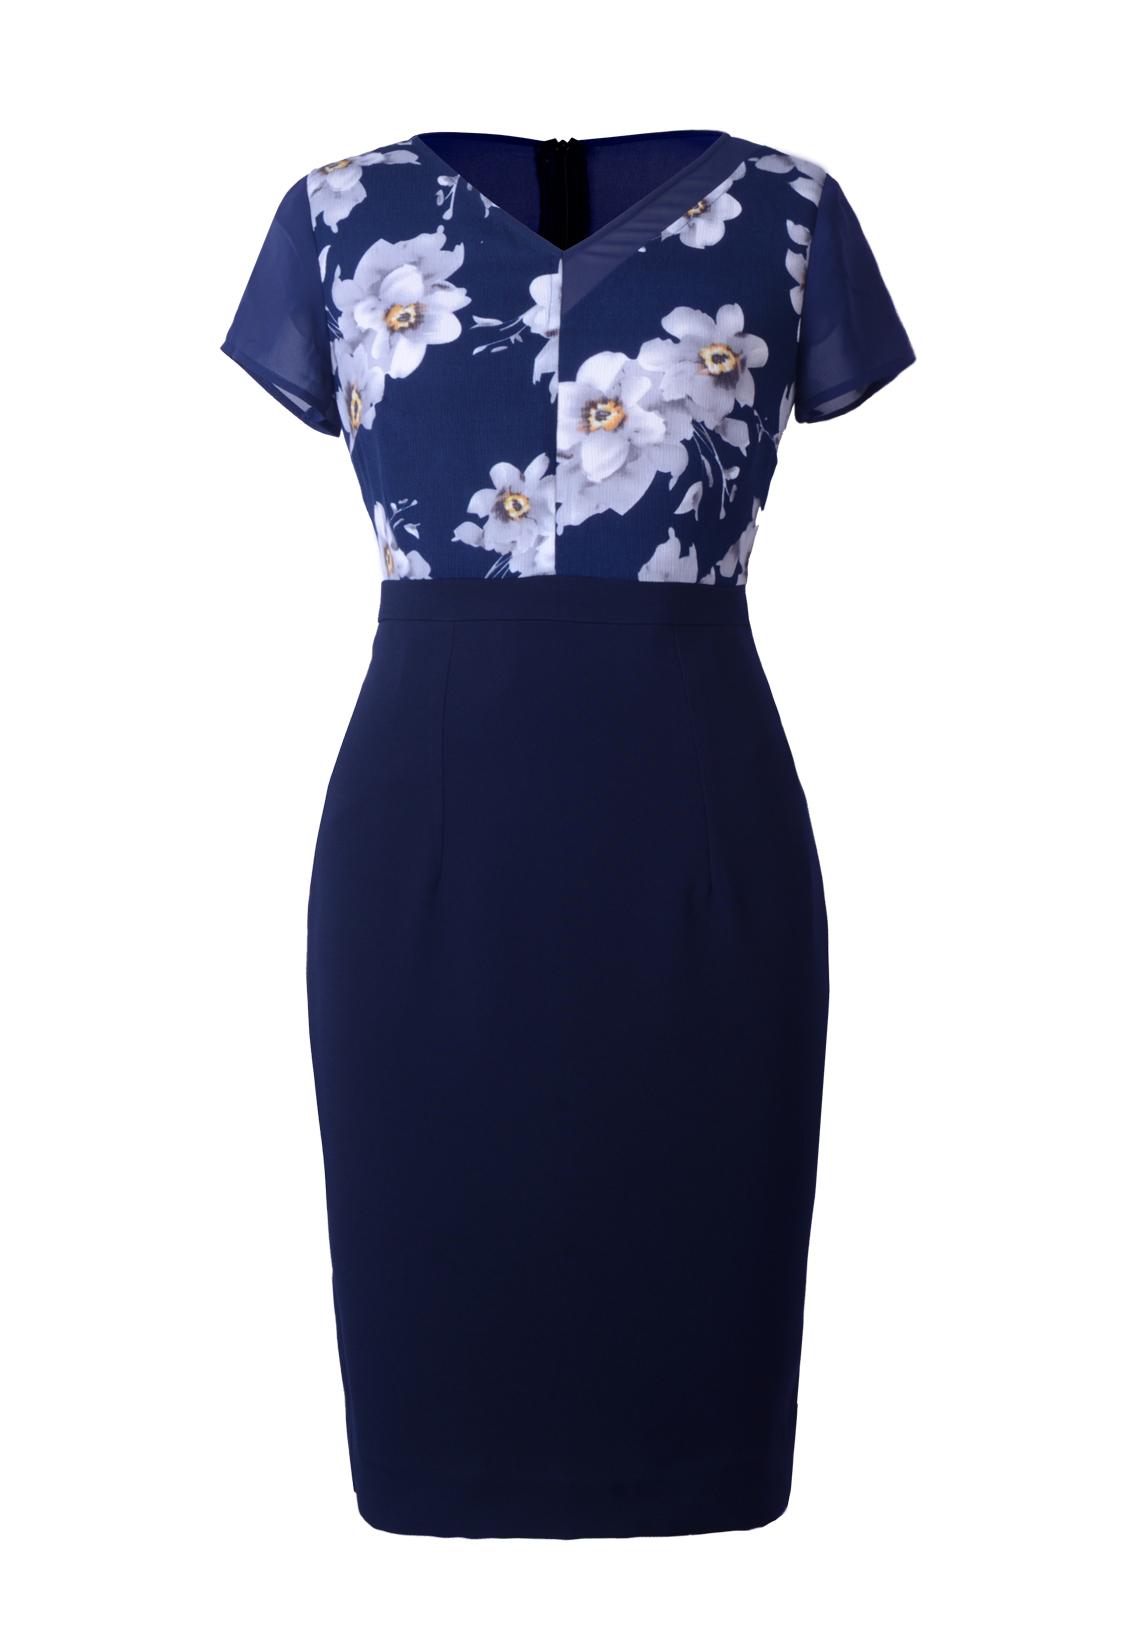 Đầm ôm phối hoa